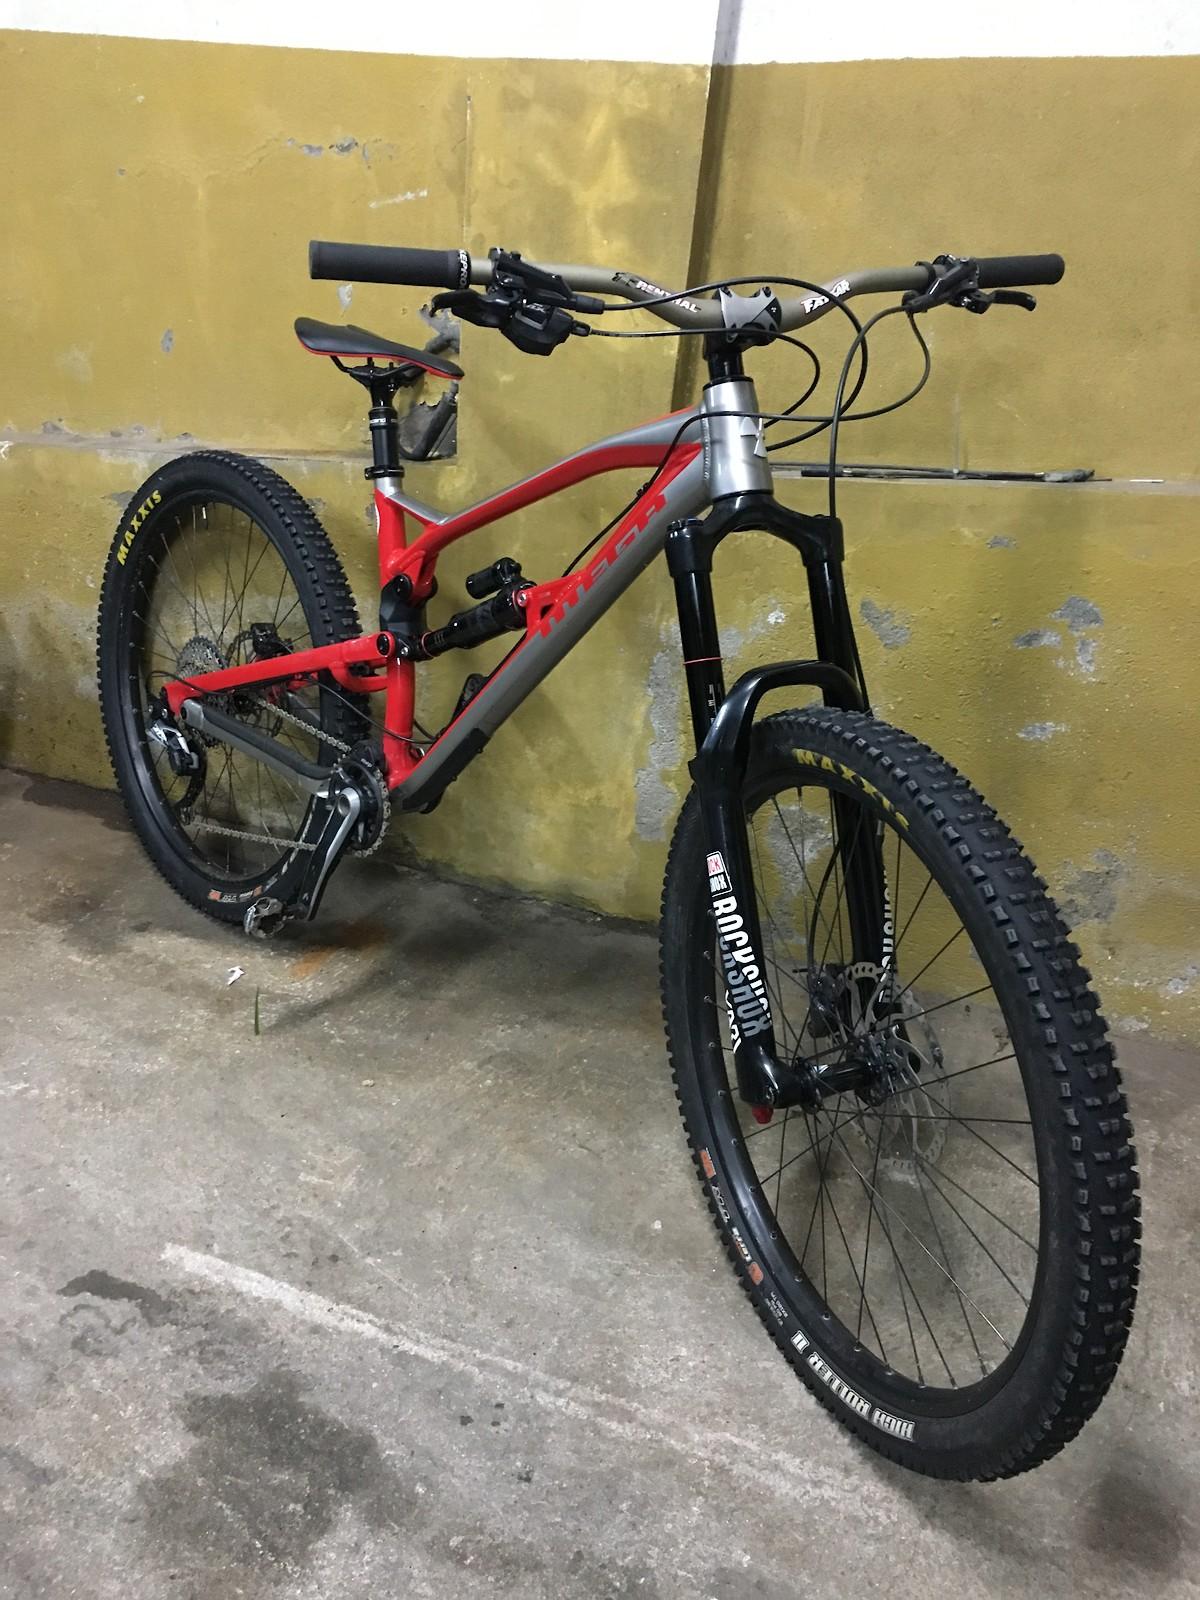 EE8A237E-6259-4959-8B7E-8B956376CE7B - Ricardo_Azevedo - Mountain Biking Pictures - Vital MTB